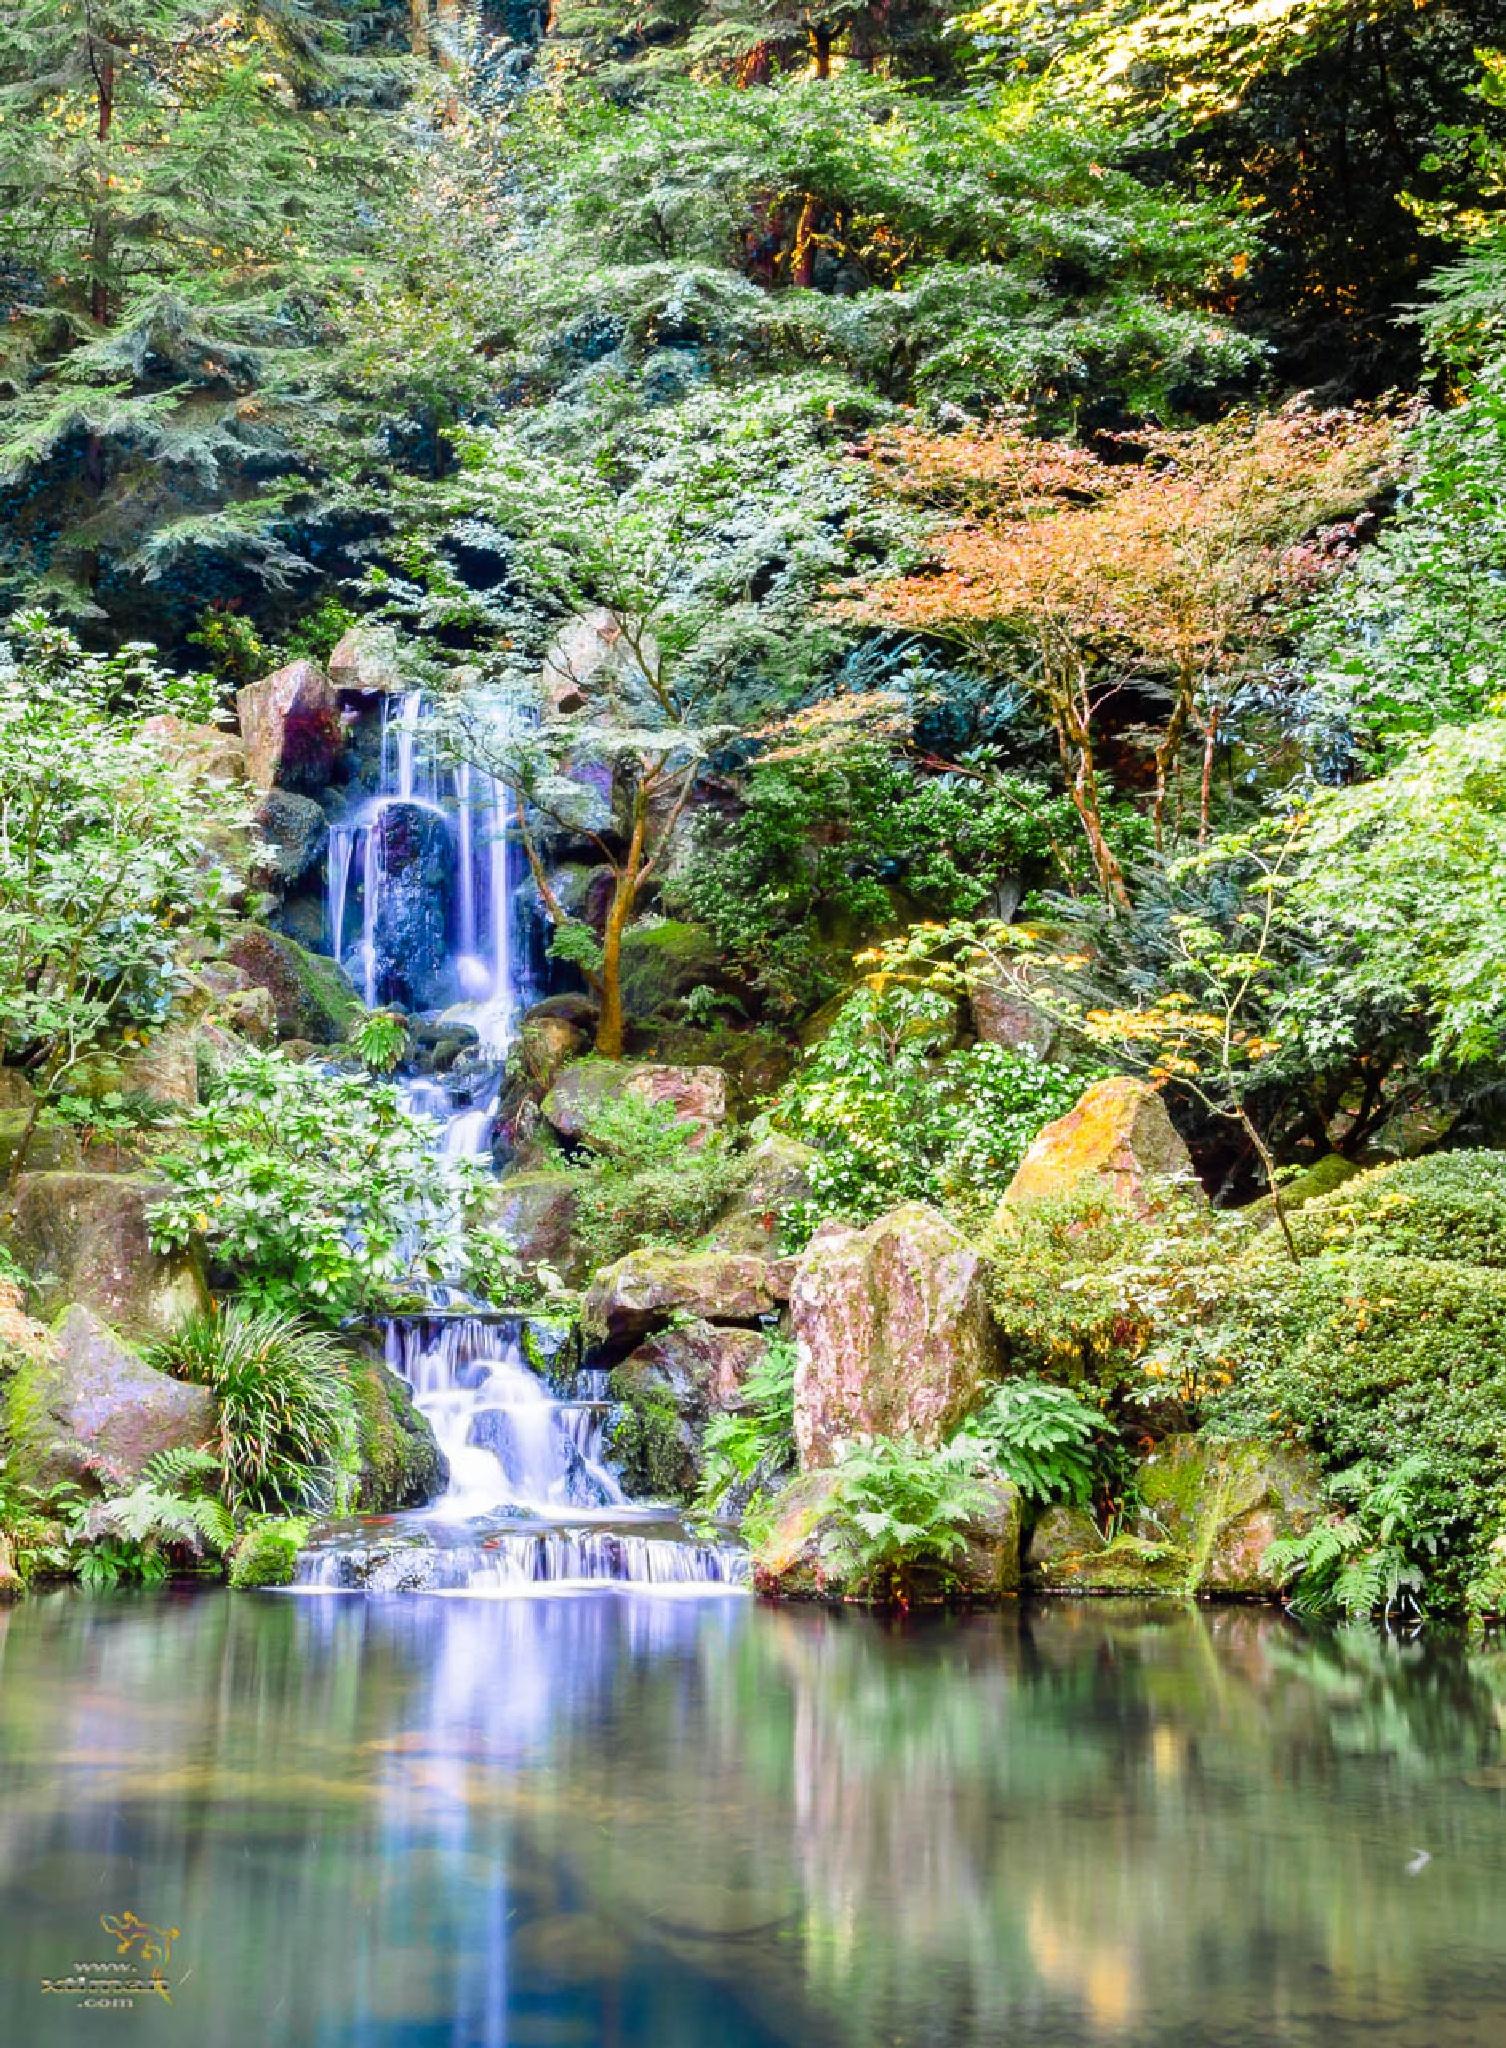 Waterfall by Mark Dunton